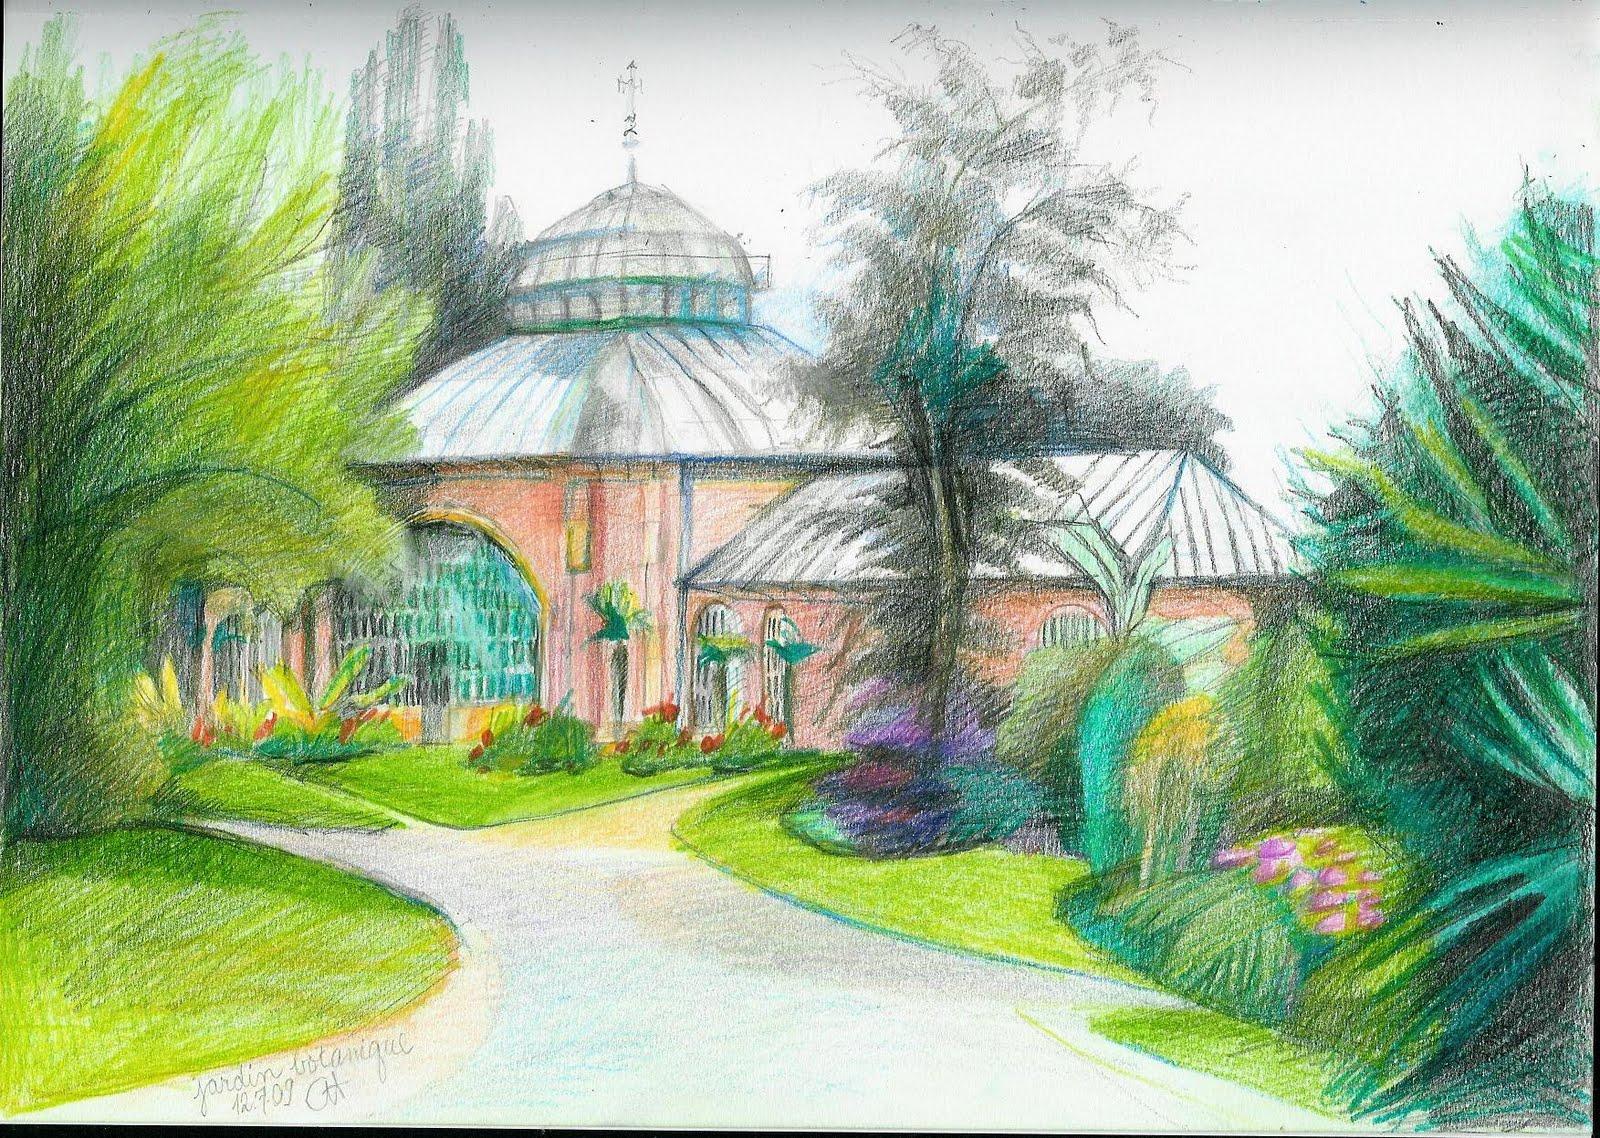 Catherine hale le jardin botanique metz france for Jardin botanique metz